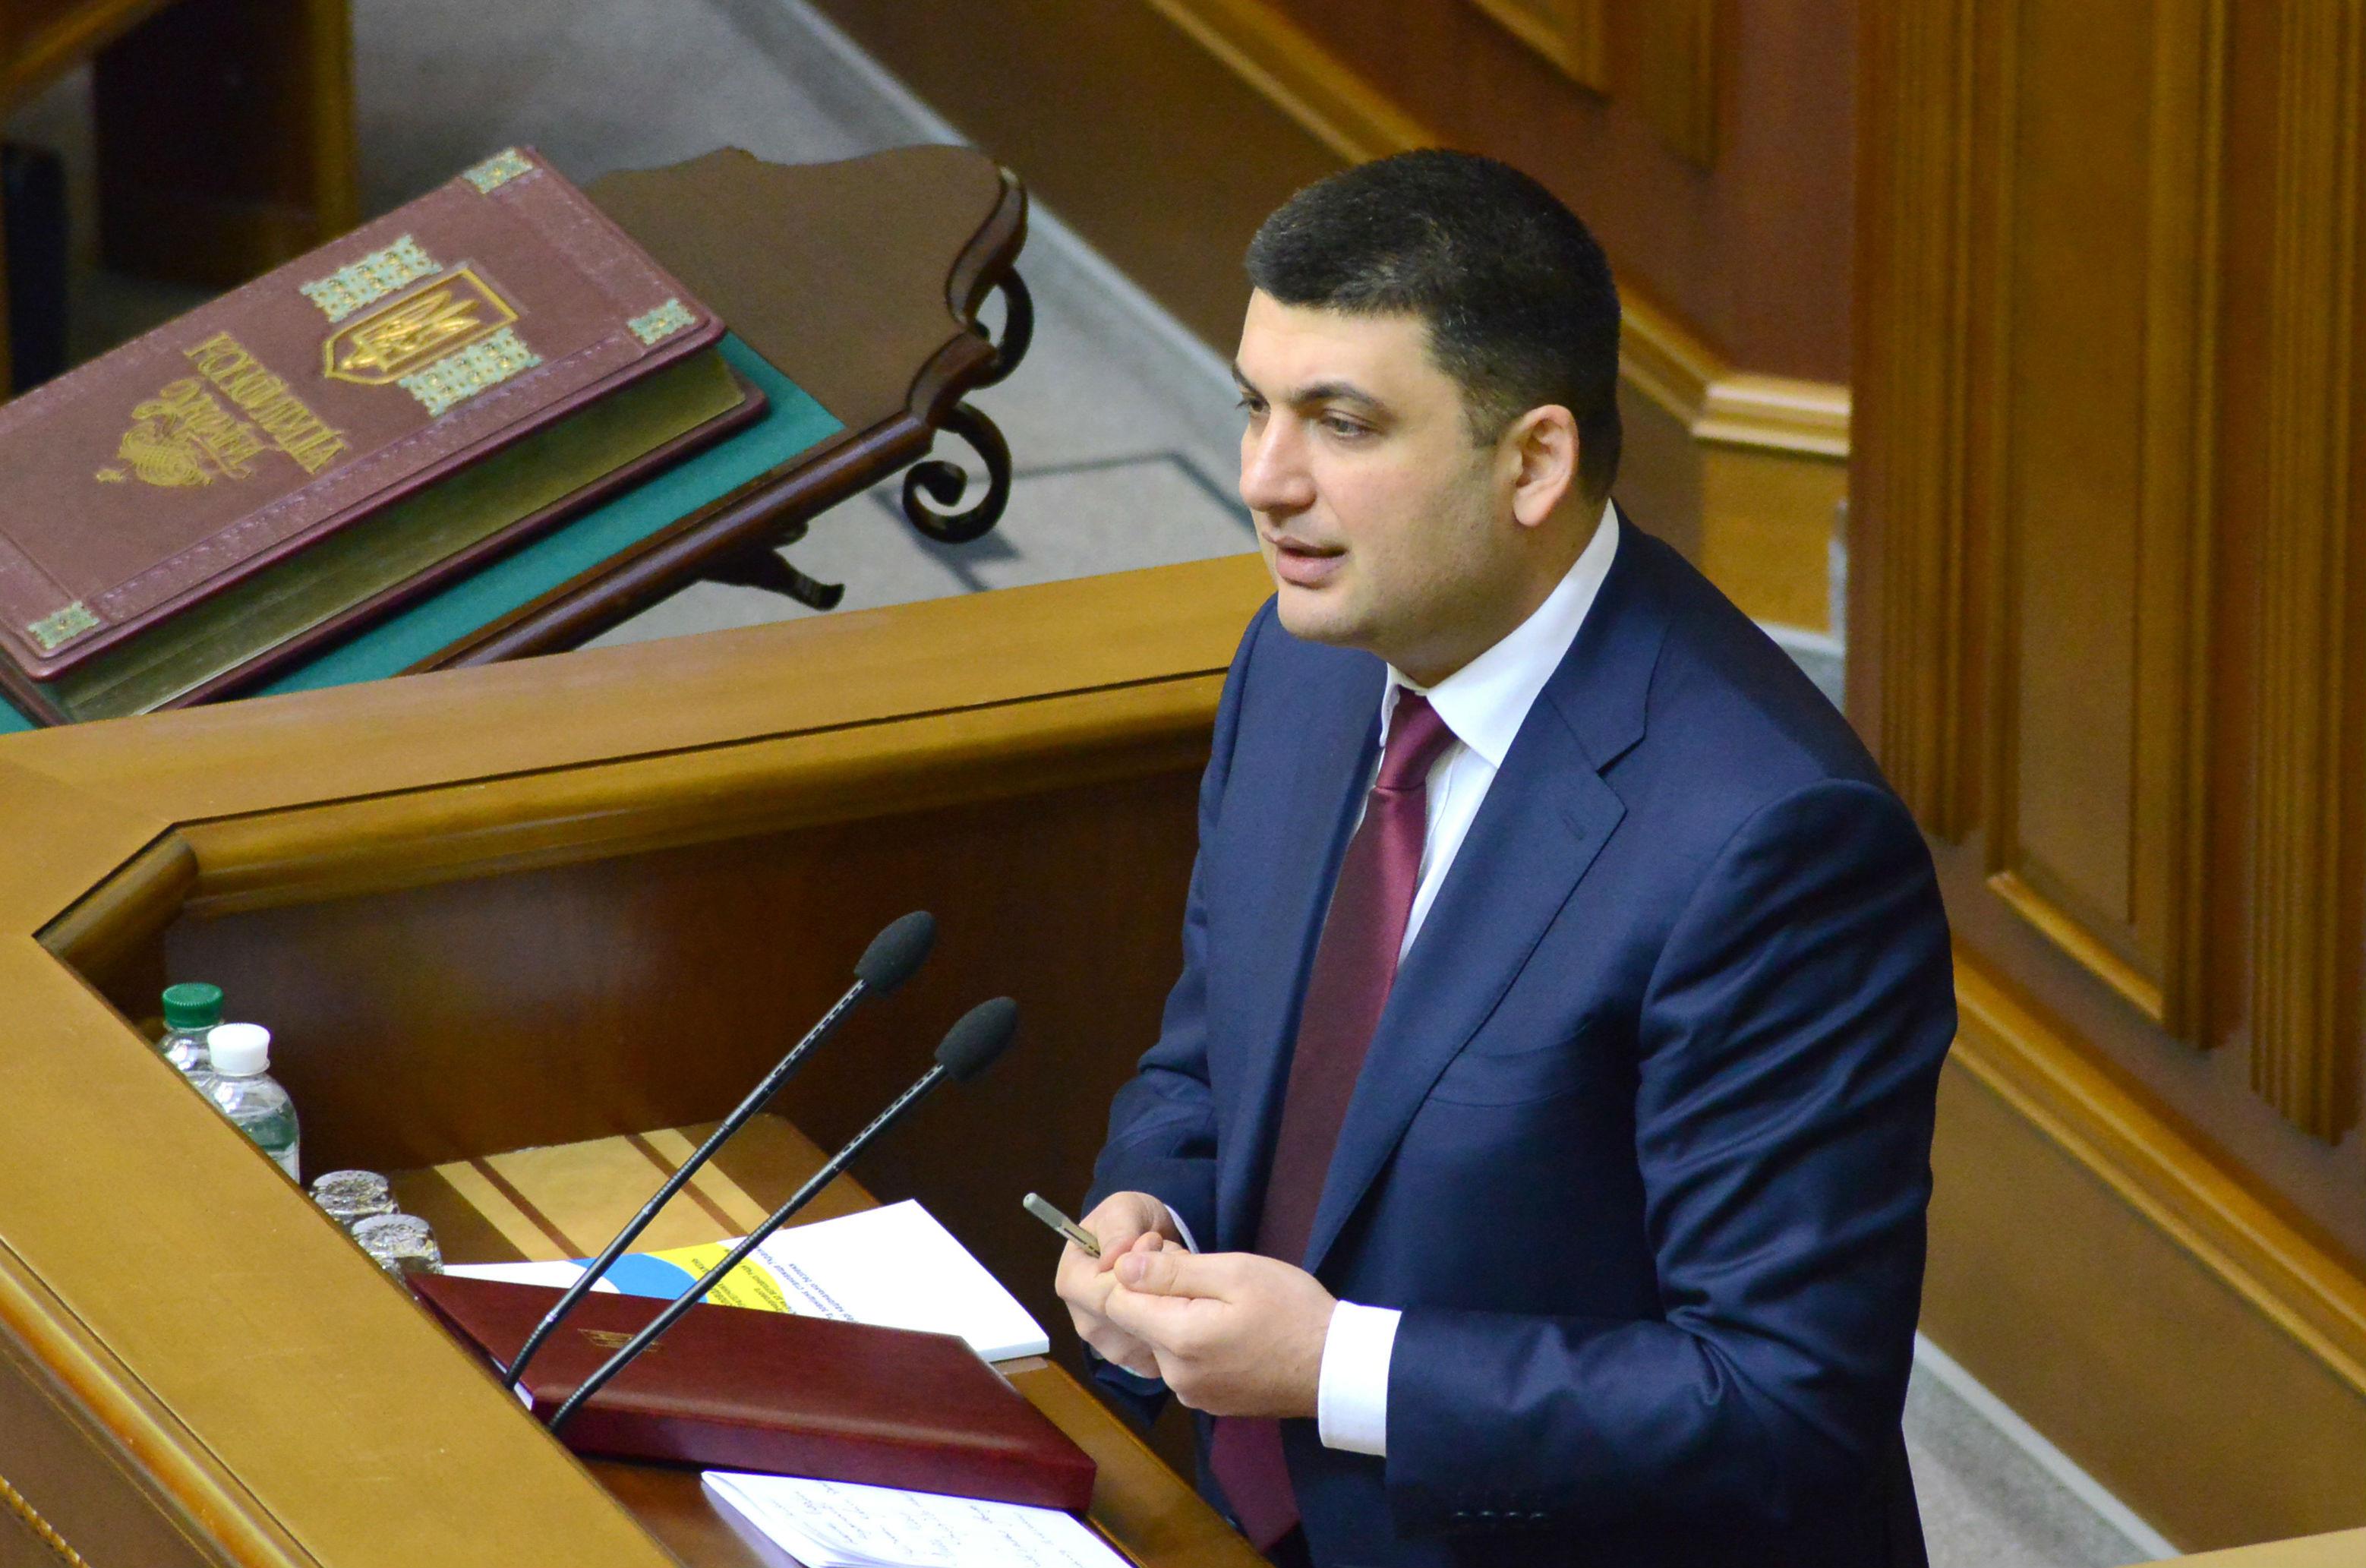 Ukraine Defies Anti-Semitic Stereotypes